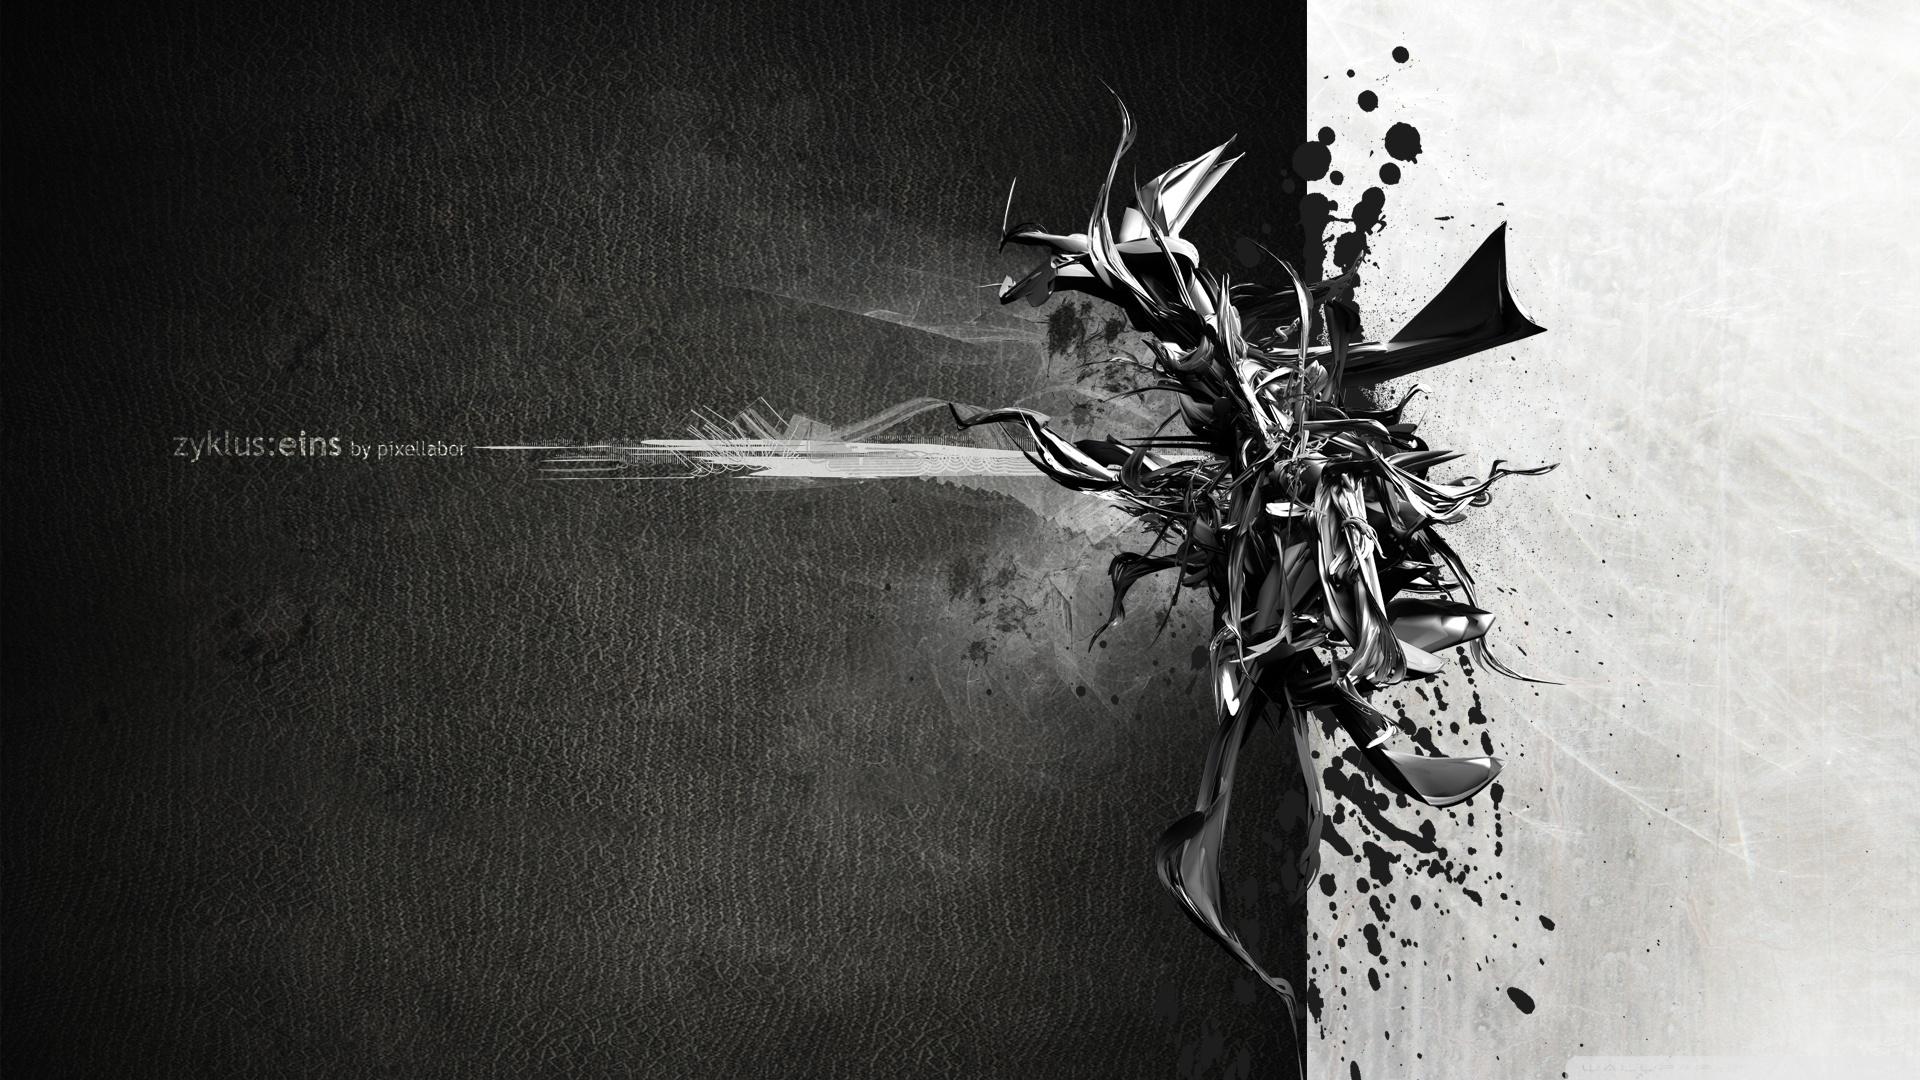 Black And White Art HD desktop wallpaper : High Definition